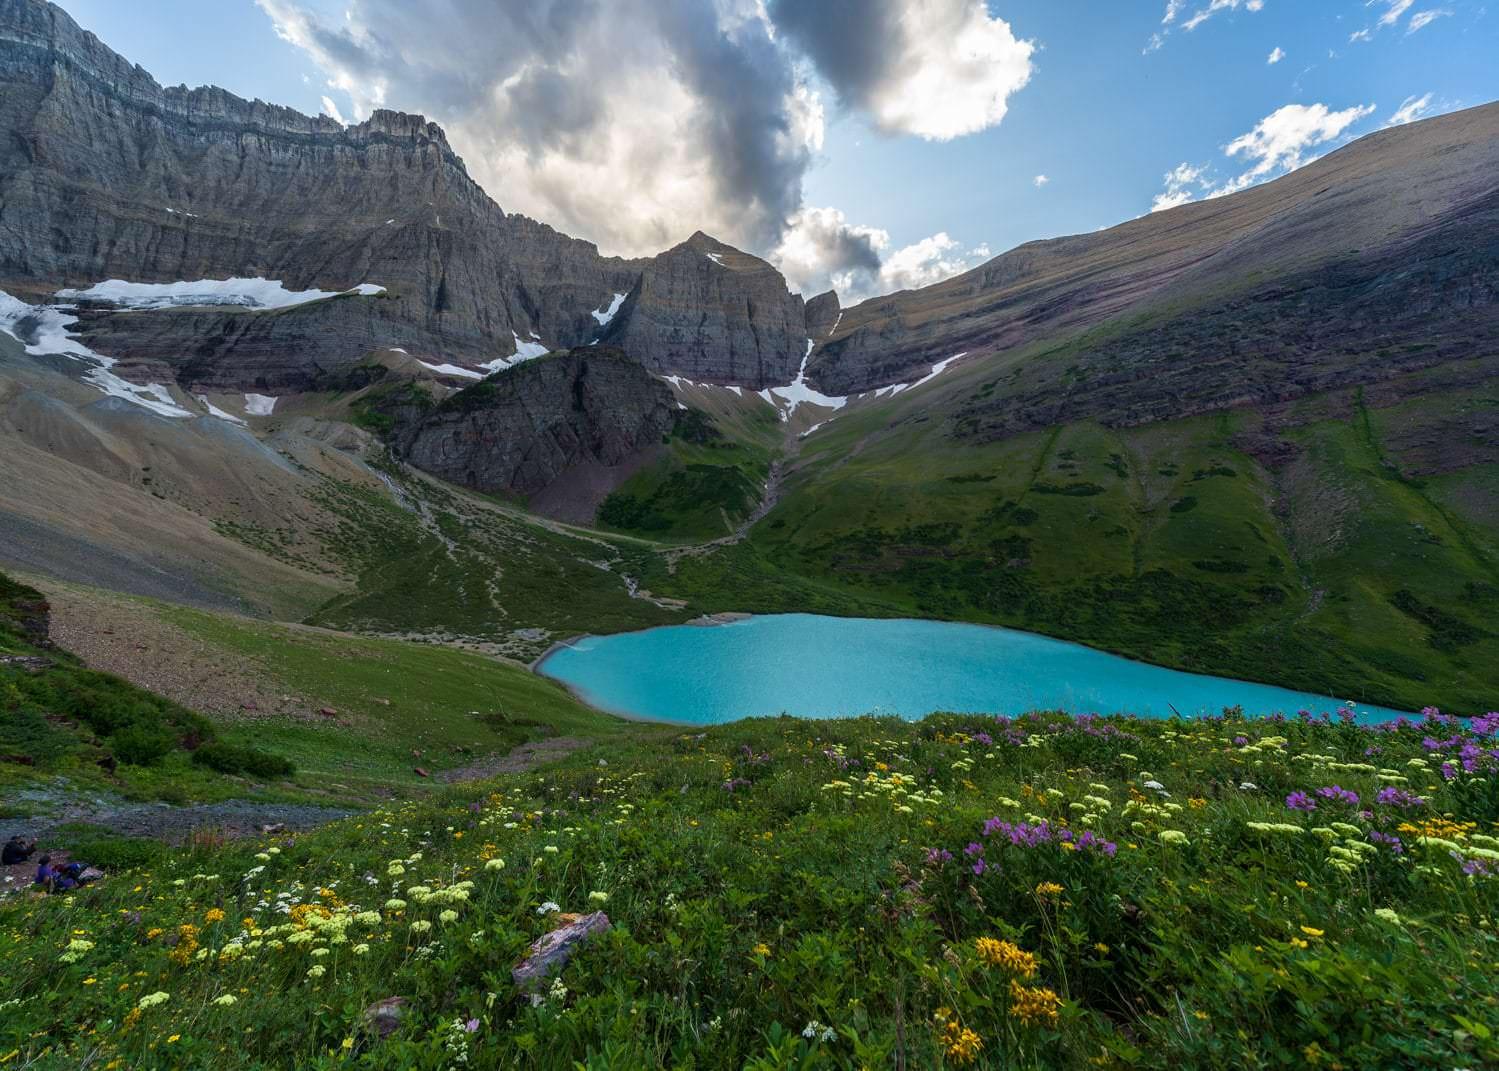 Cracker Lake Glacier National Park Elopement Guide & Packages